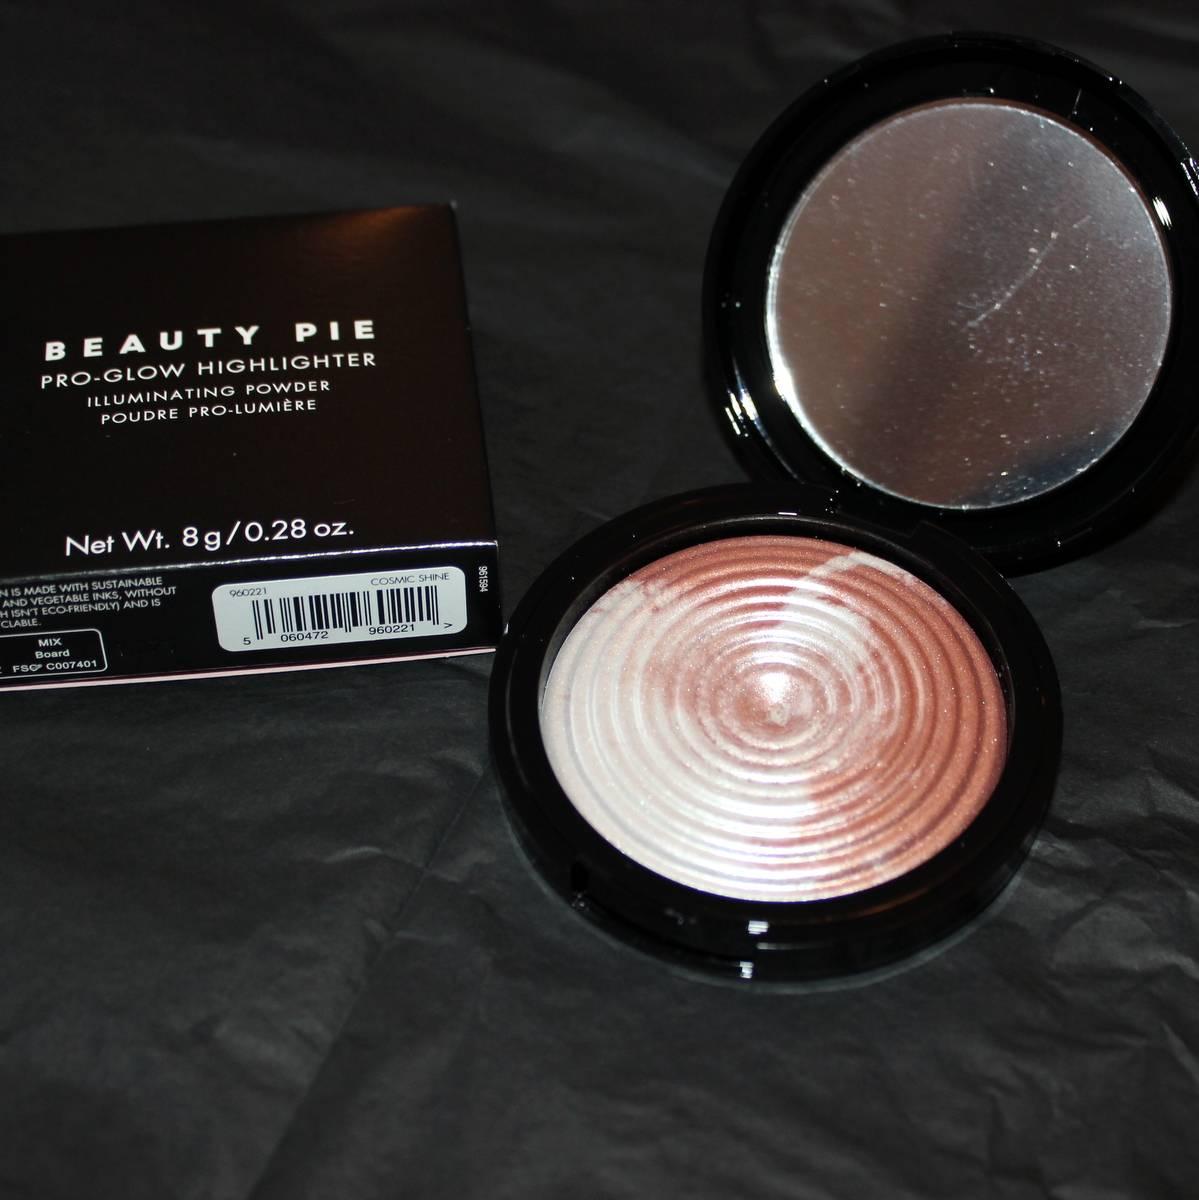 Beautypie Pro Glow Highlighter